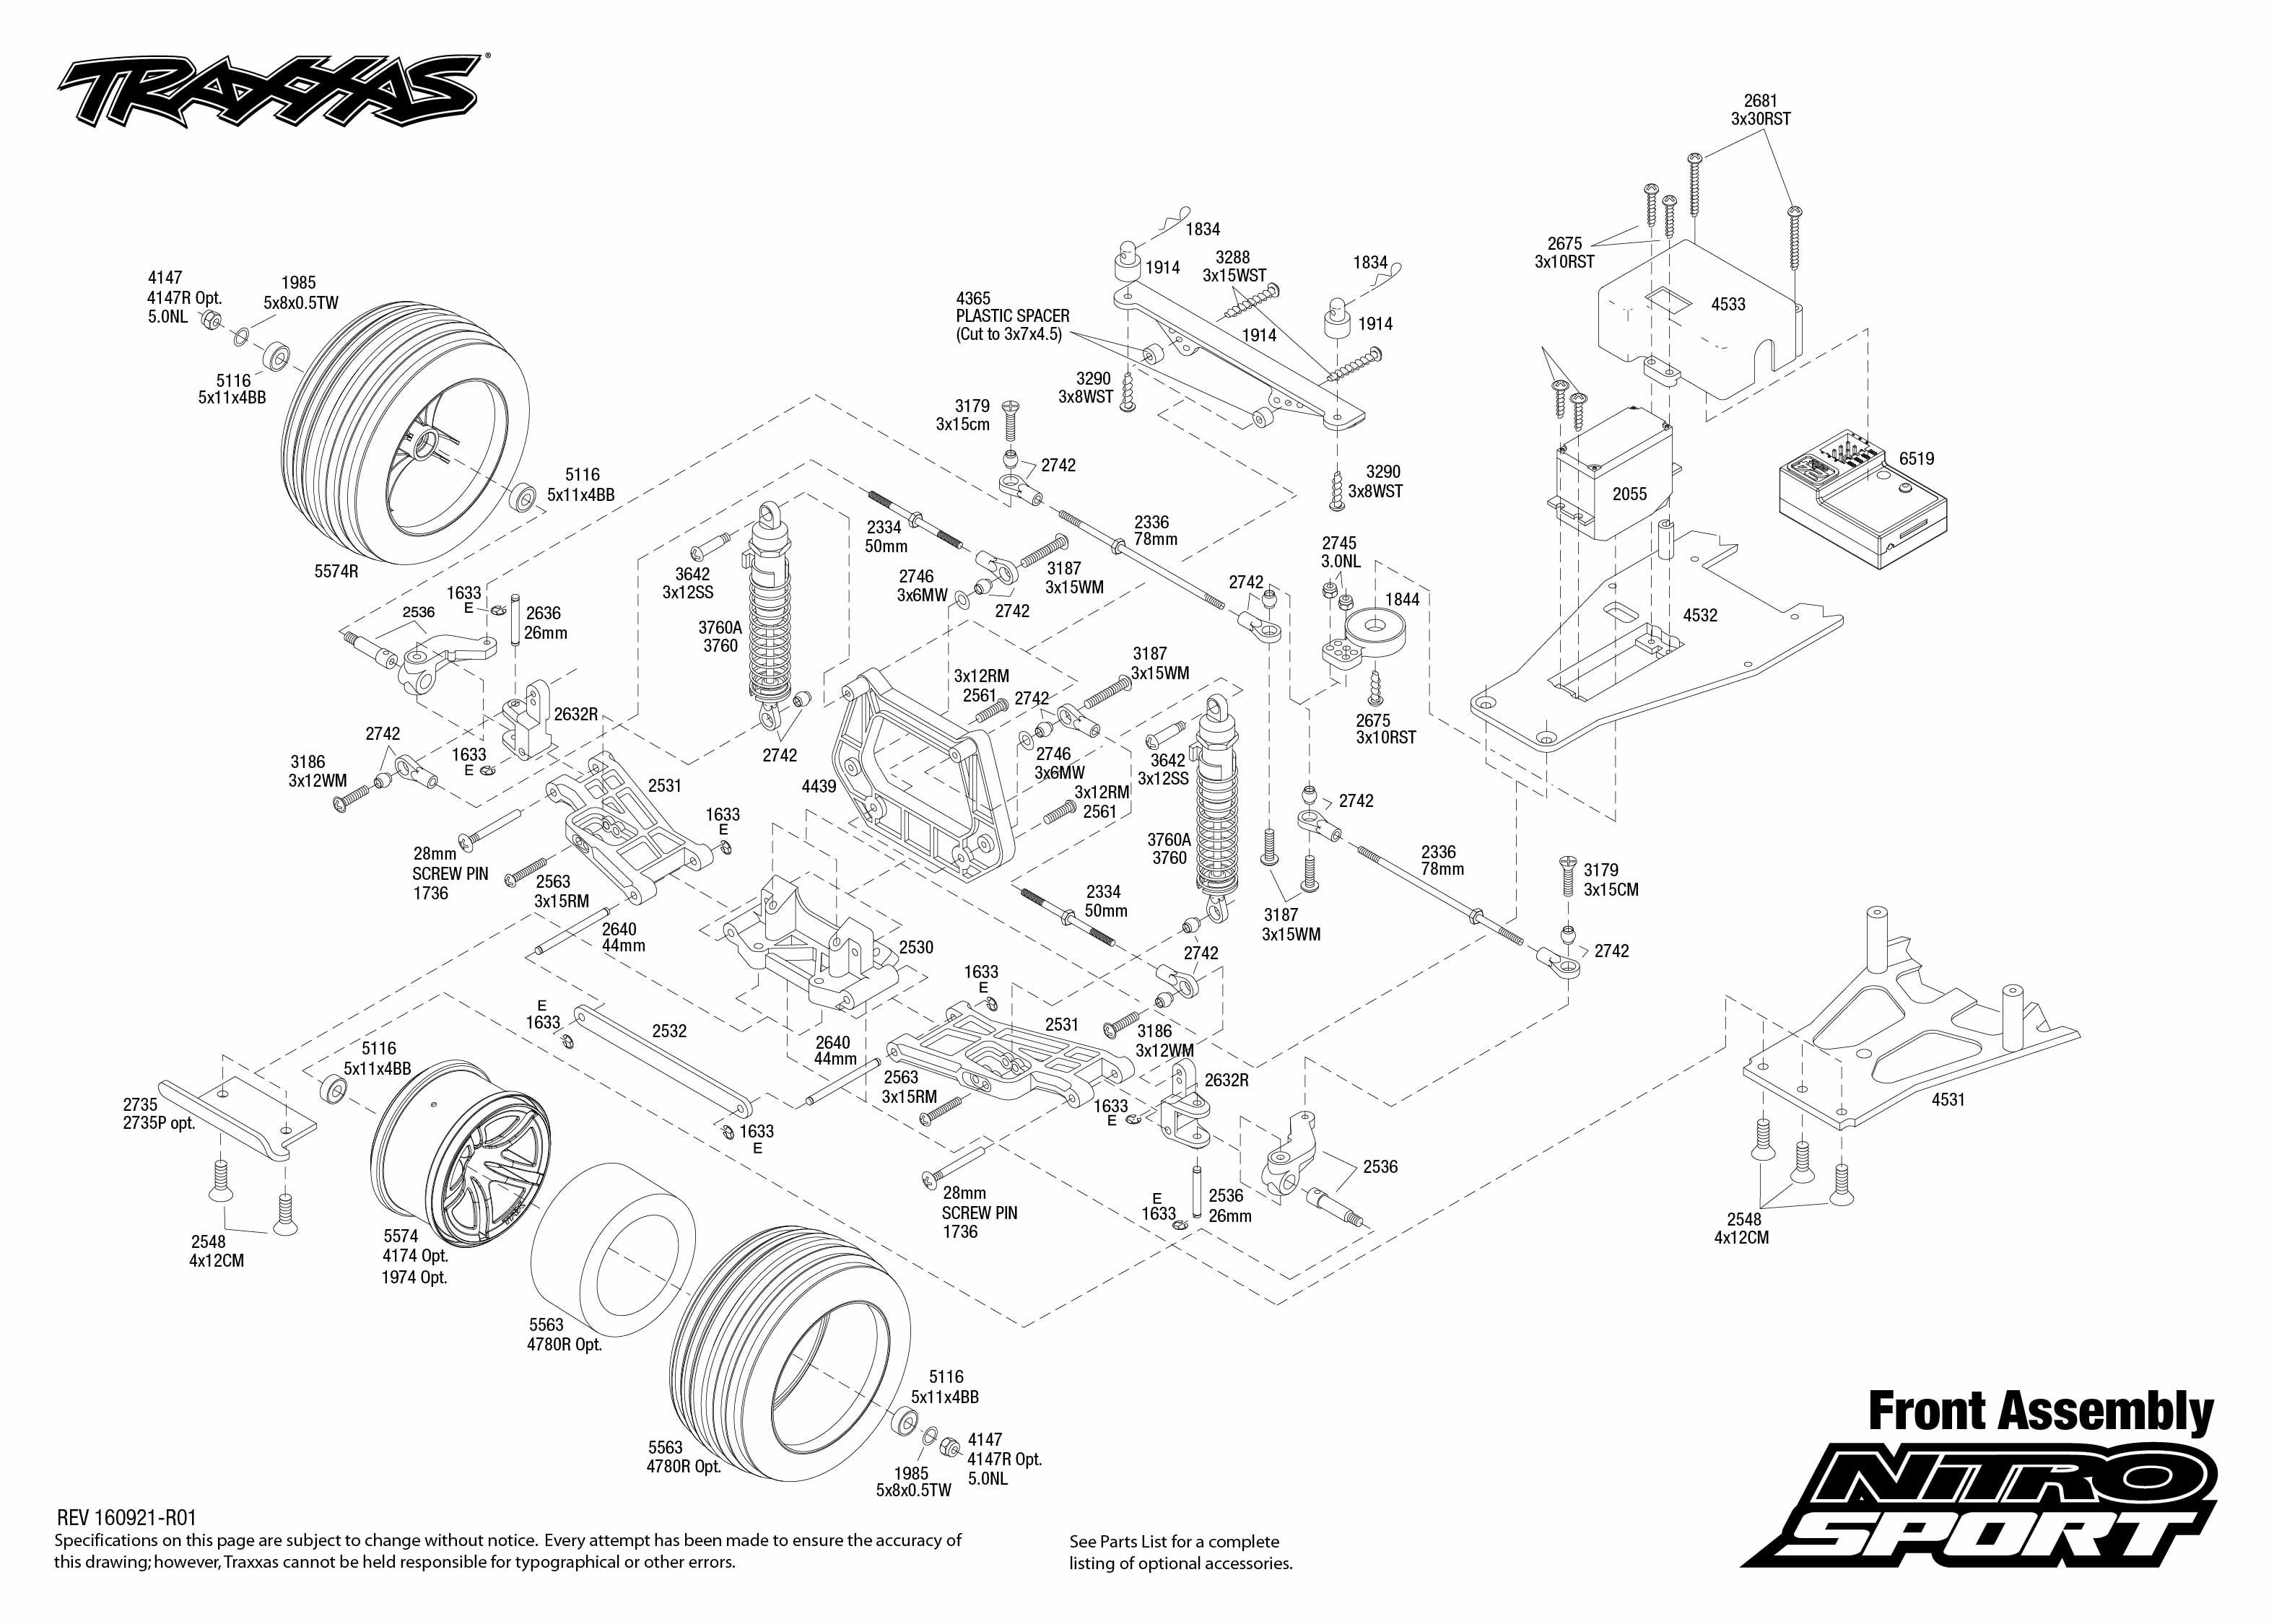 nitro sport 45104 1 front assembly exploded view traxxas tech rh pinterest com Traxxas Nitro RC traxxas nitro sport parts list